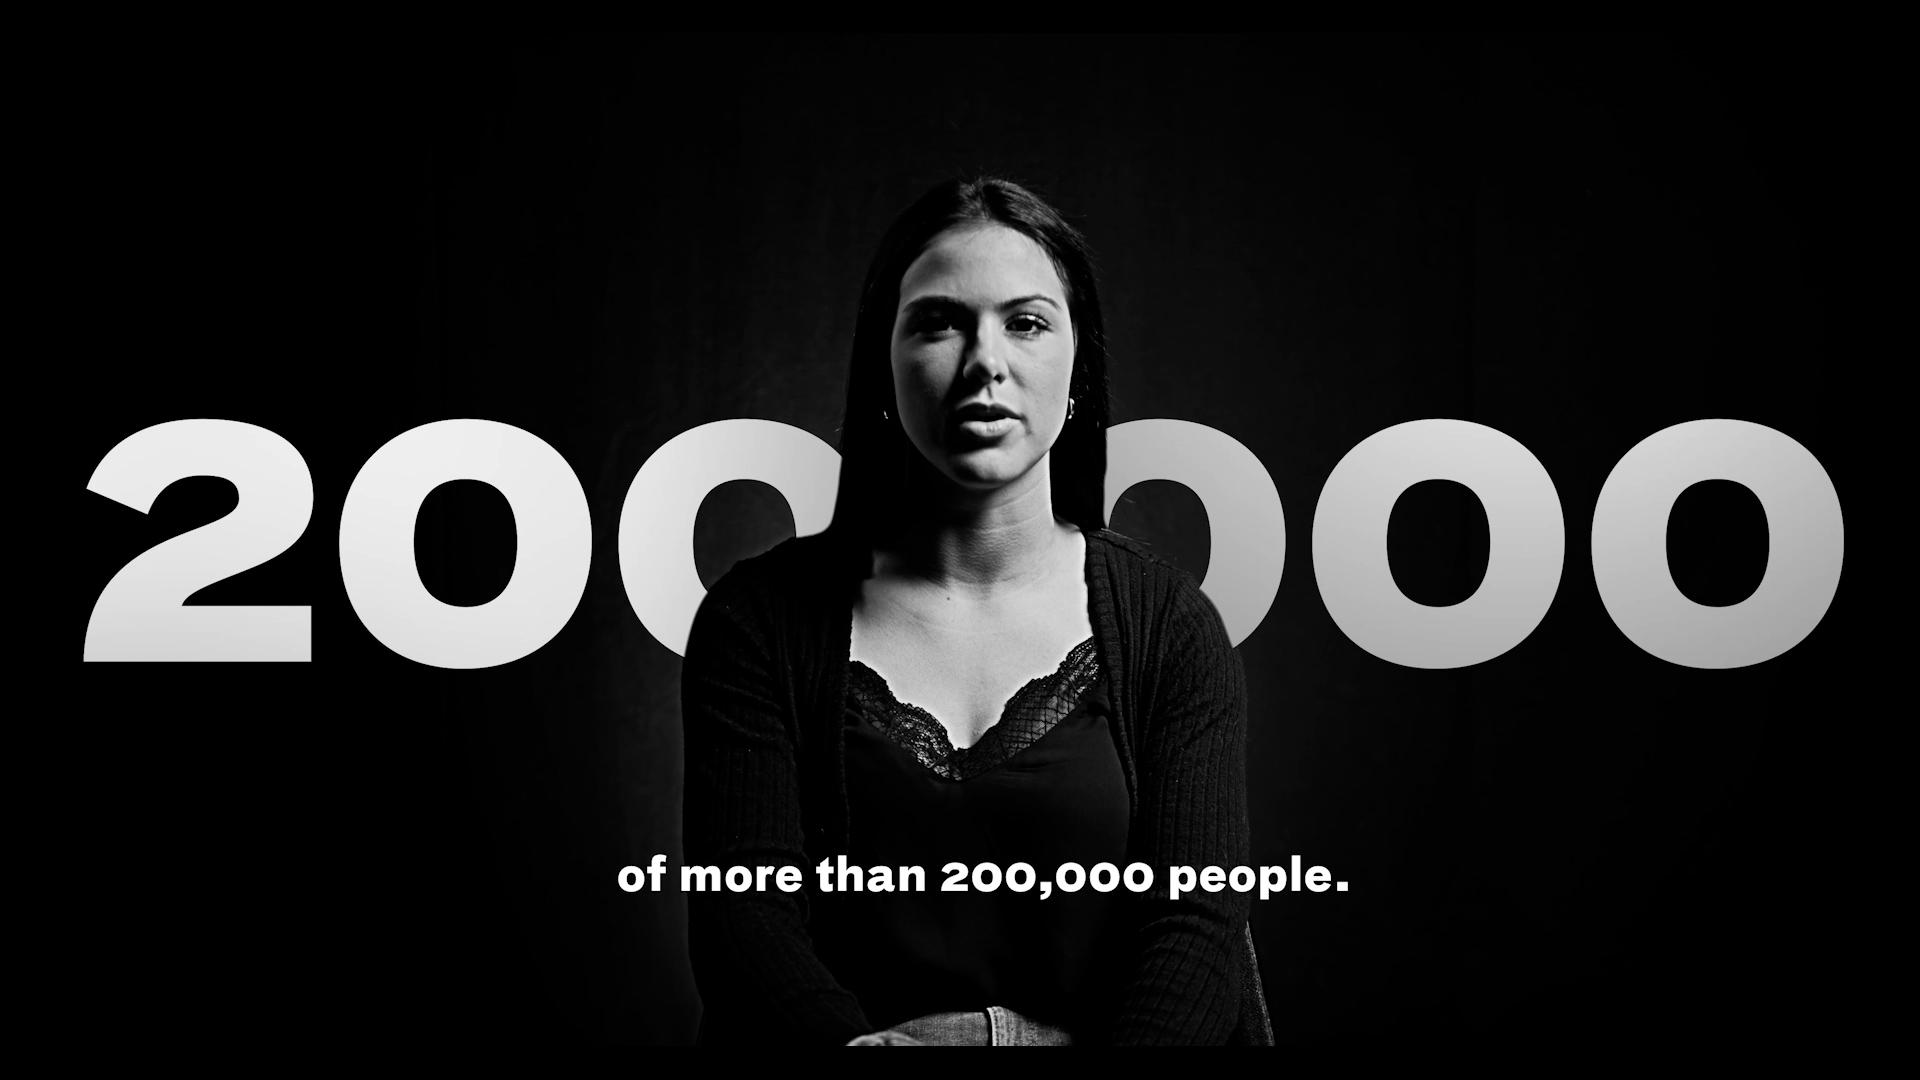 Douglas College 2020 promotional campaign video